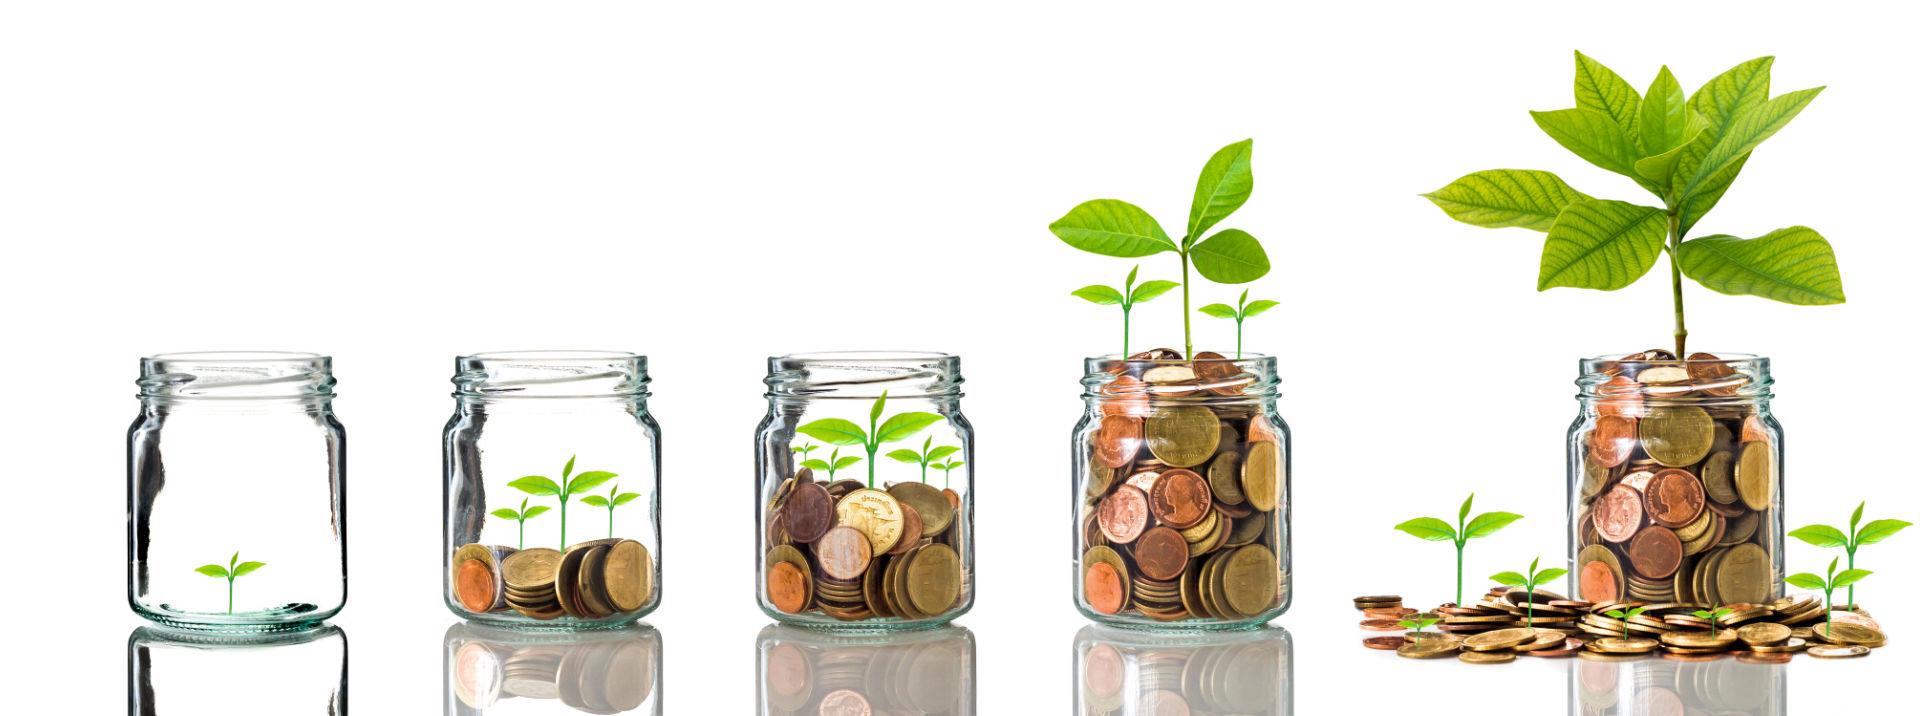 ozark bank personal savings